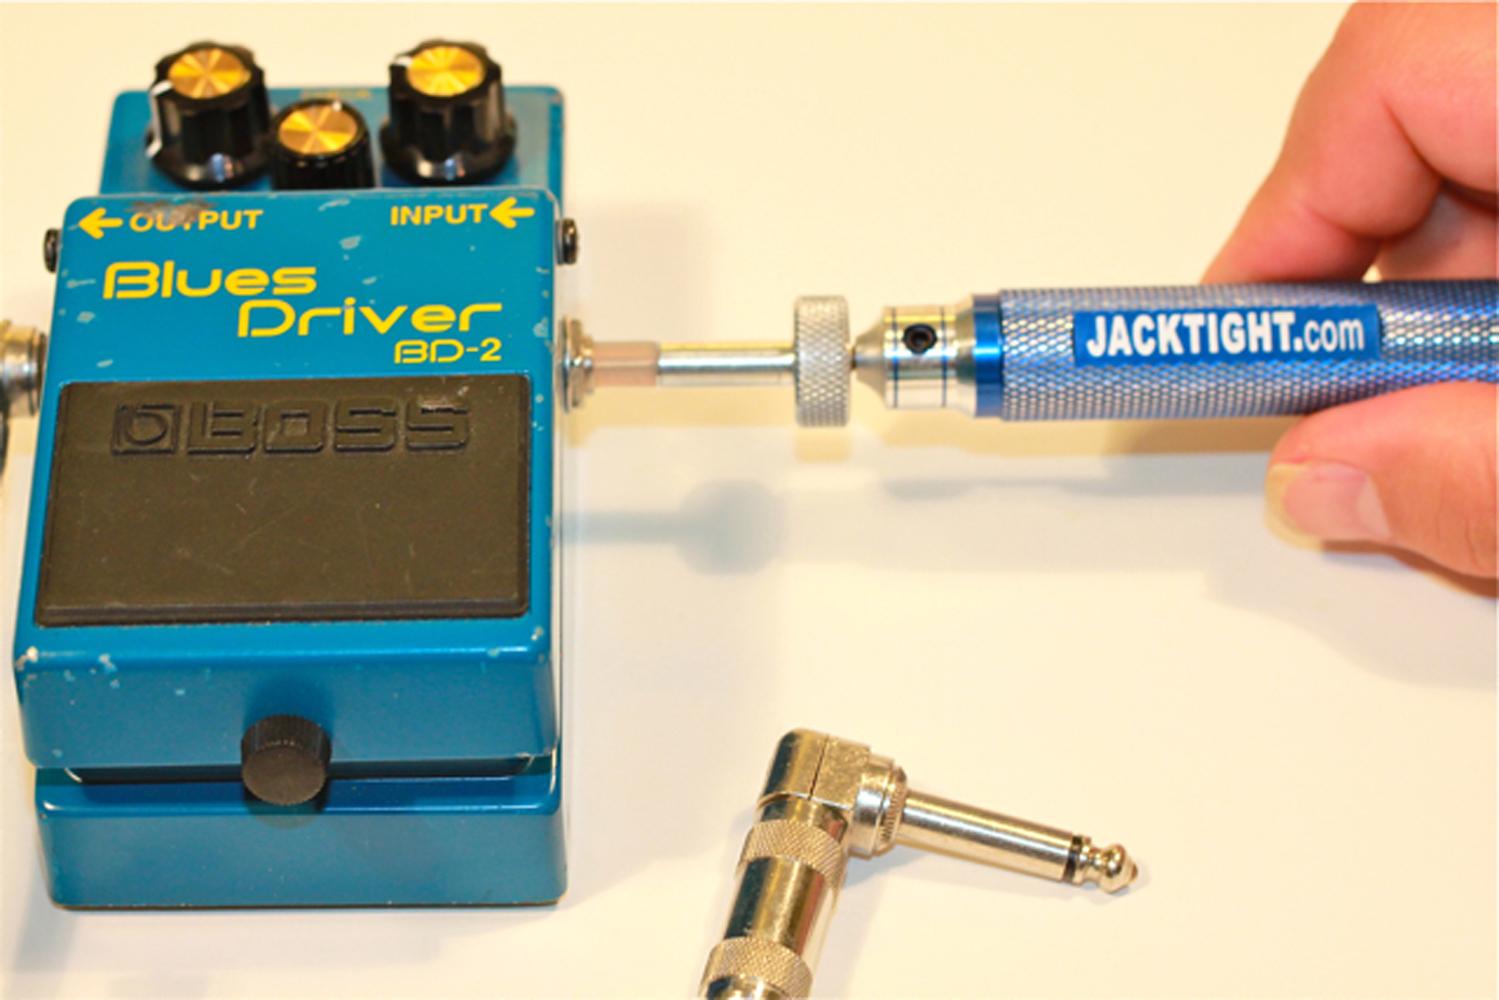 JackTight repairs guitar pedals.